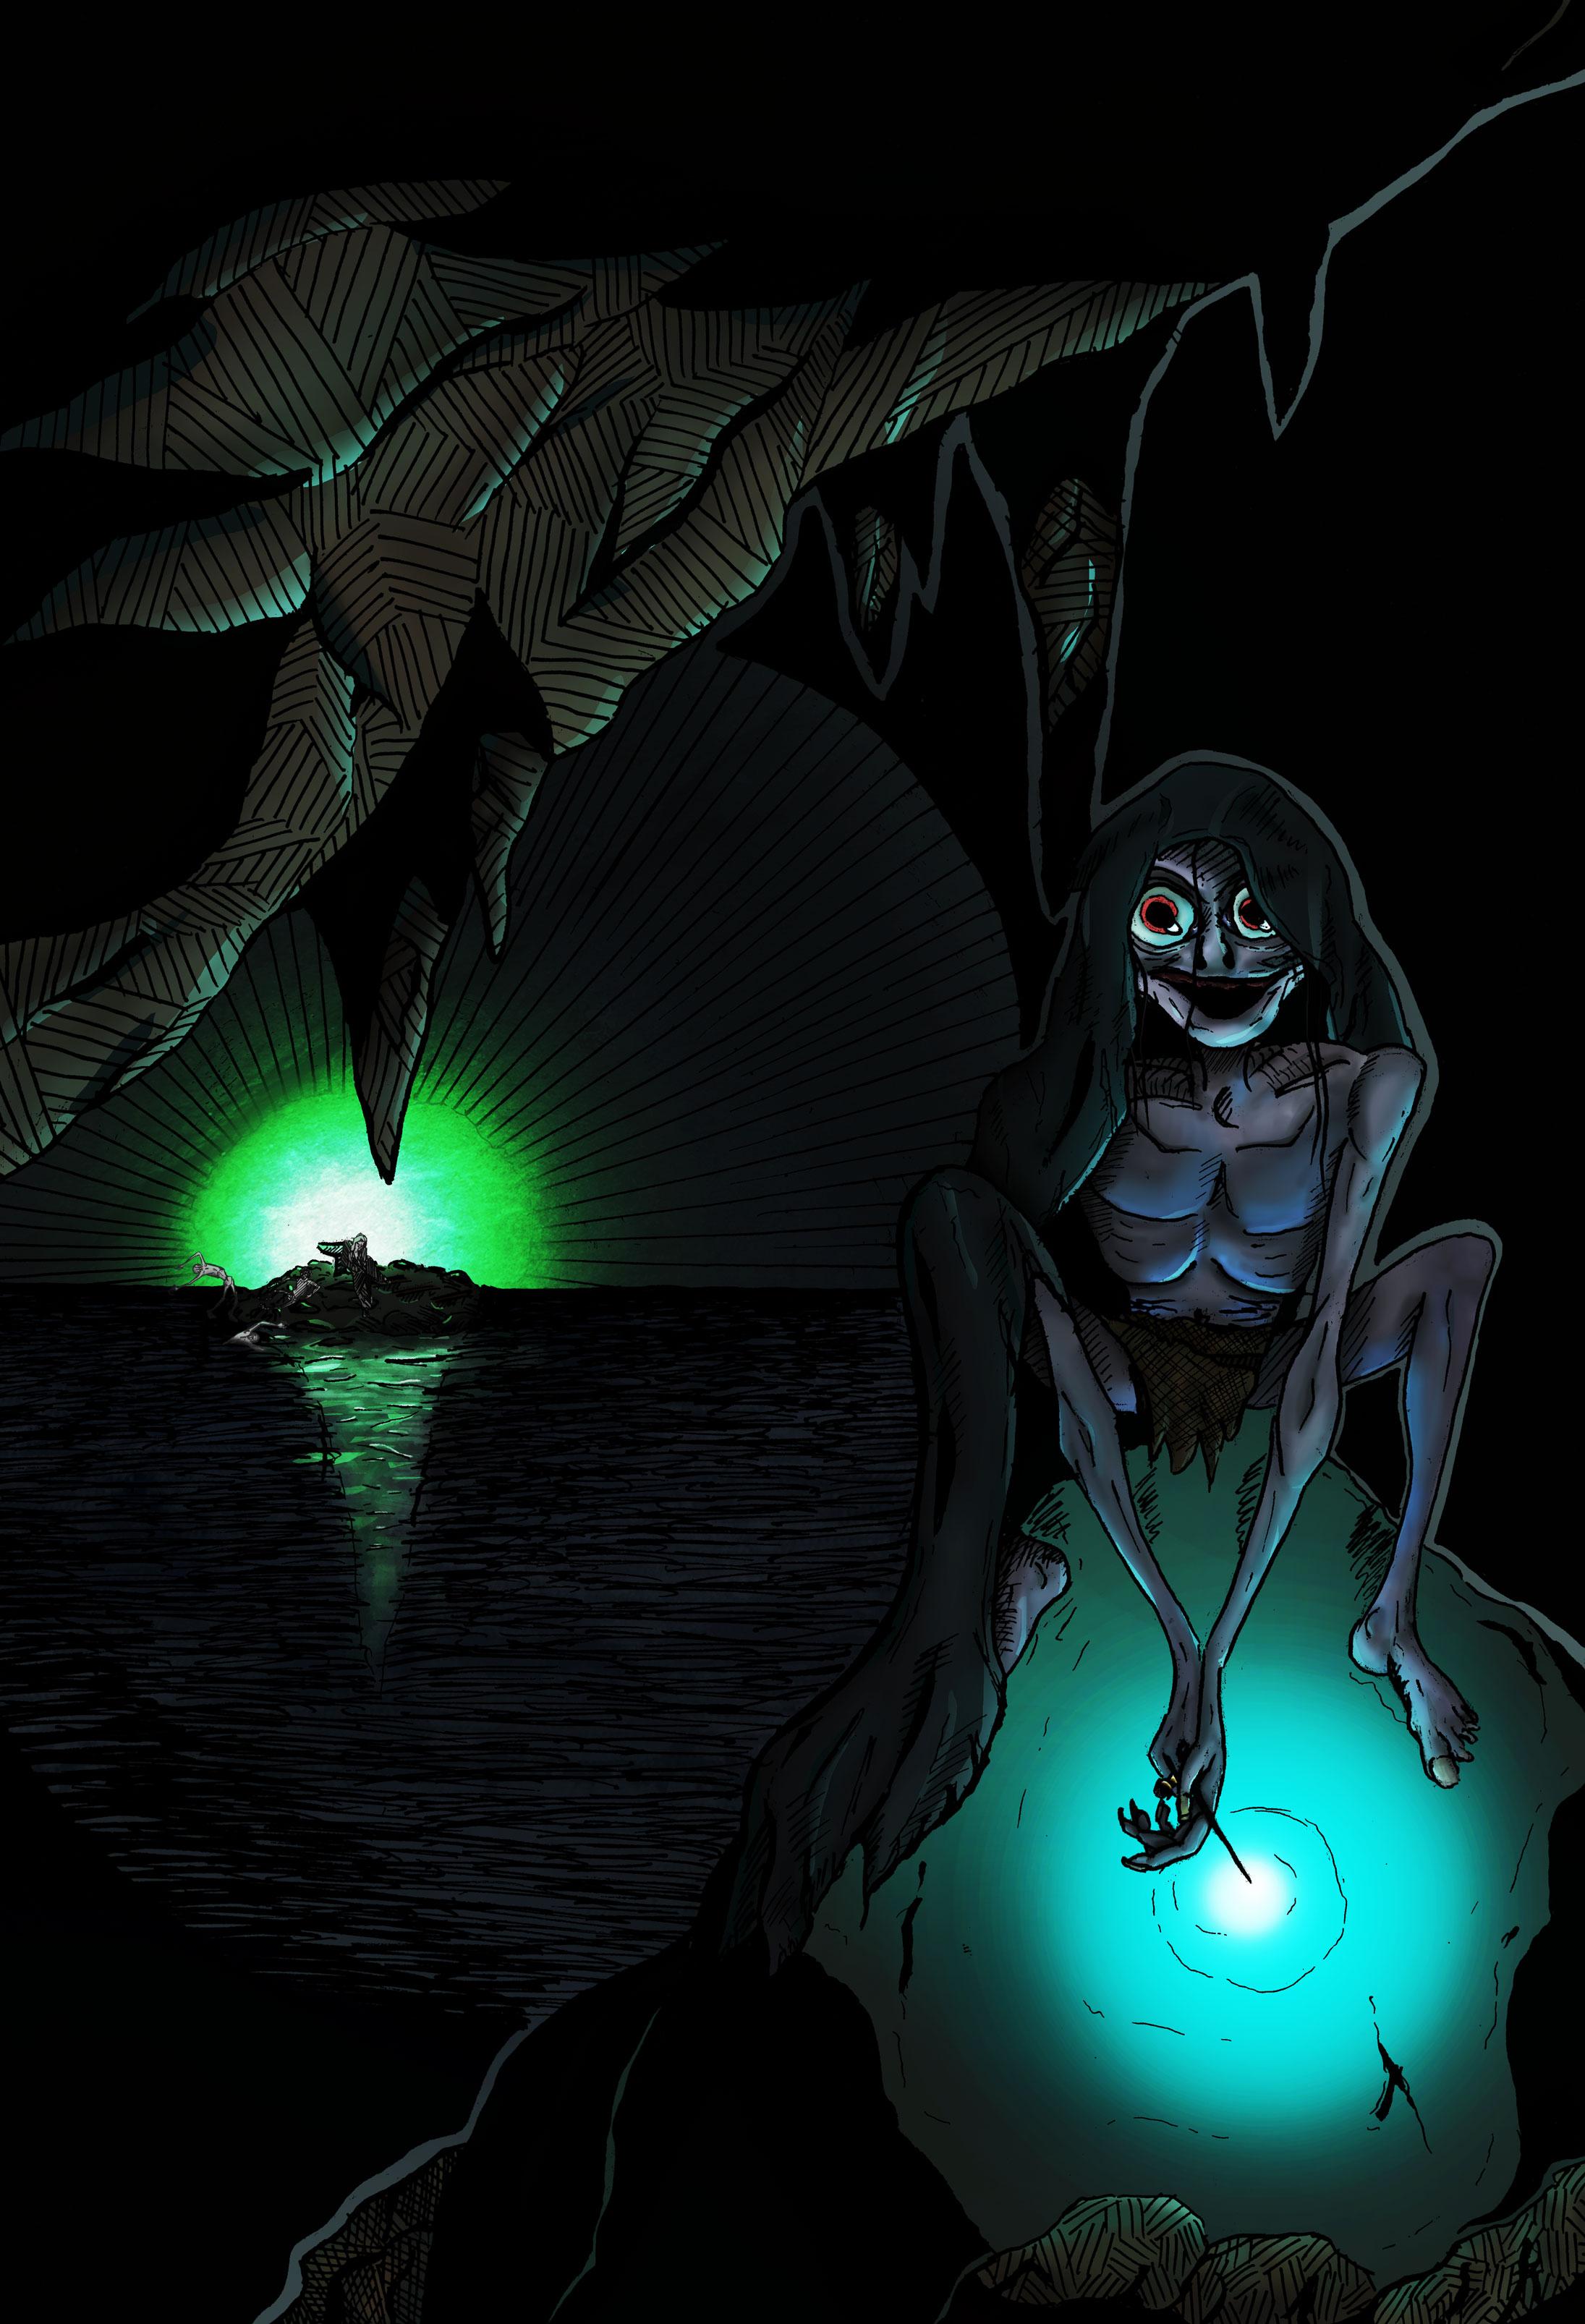 Riddle in the Dark